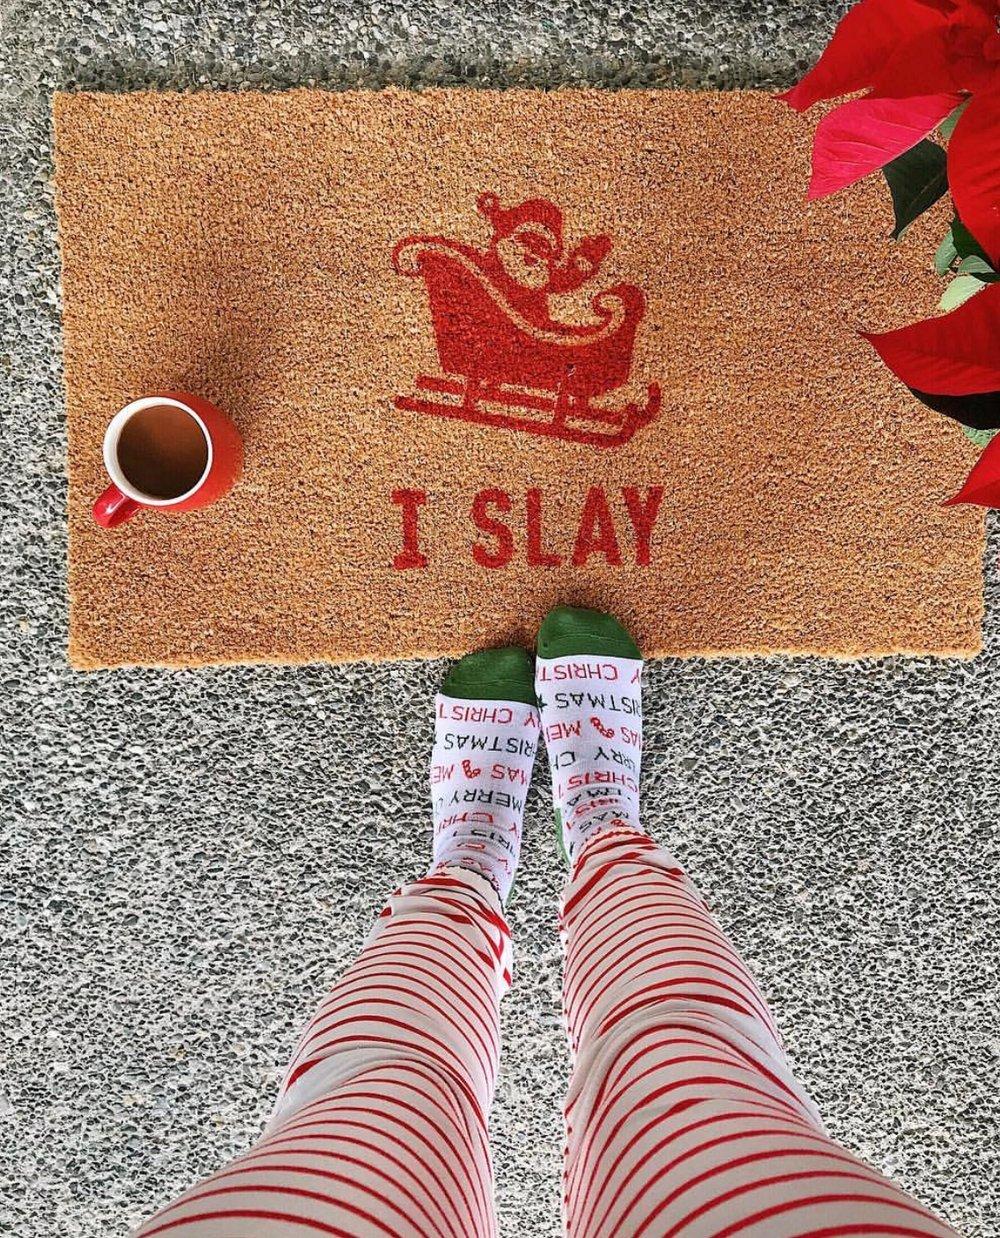 Bre Sheppard Holiday 2018 SLAY.jpg